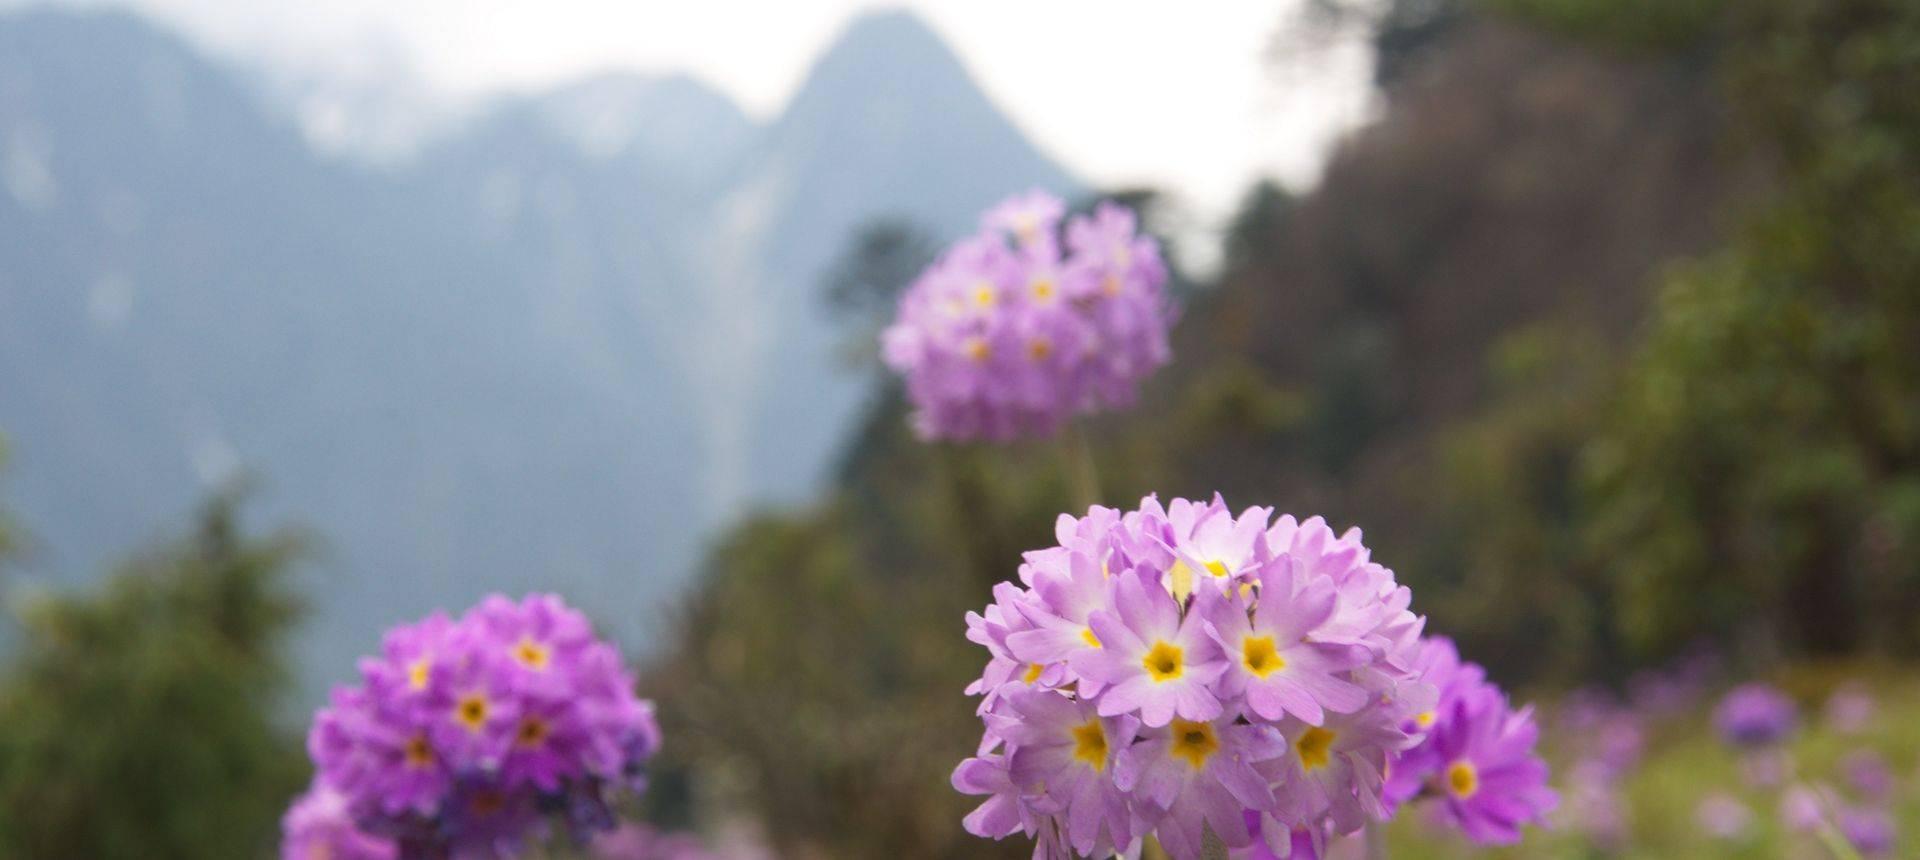 India spring flowers of sikkim darjeeling kalimpong india spring flowers of sikkim darjeeling kalimpong mightylinksfo